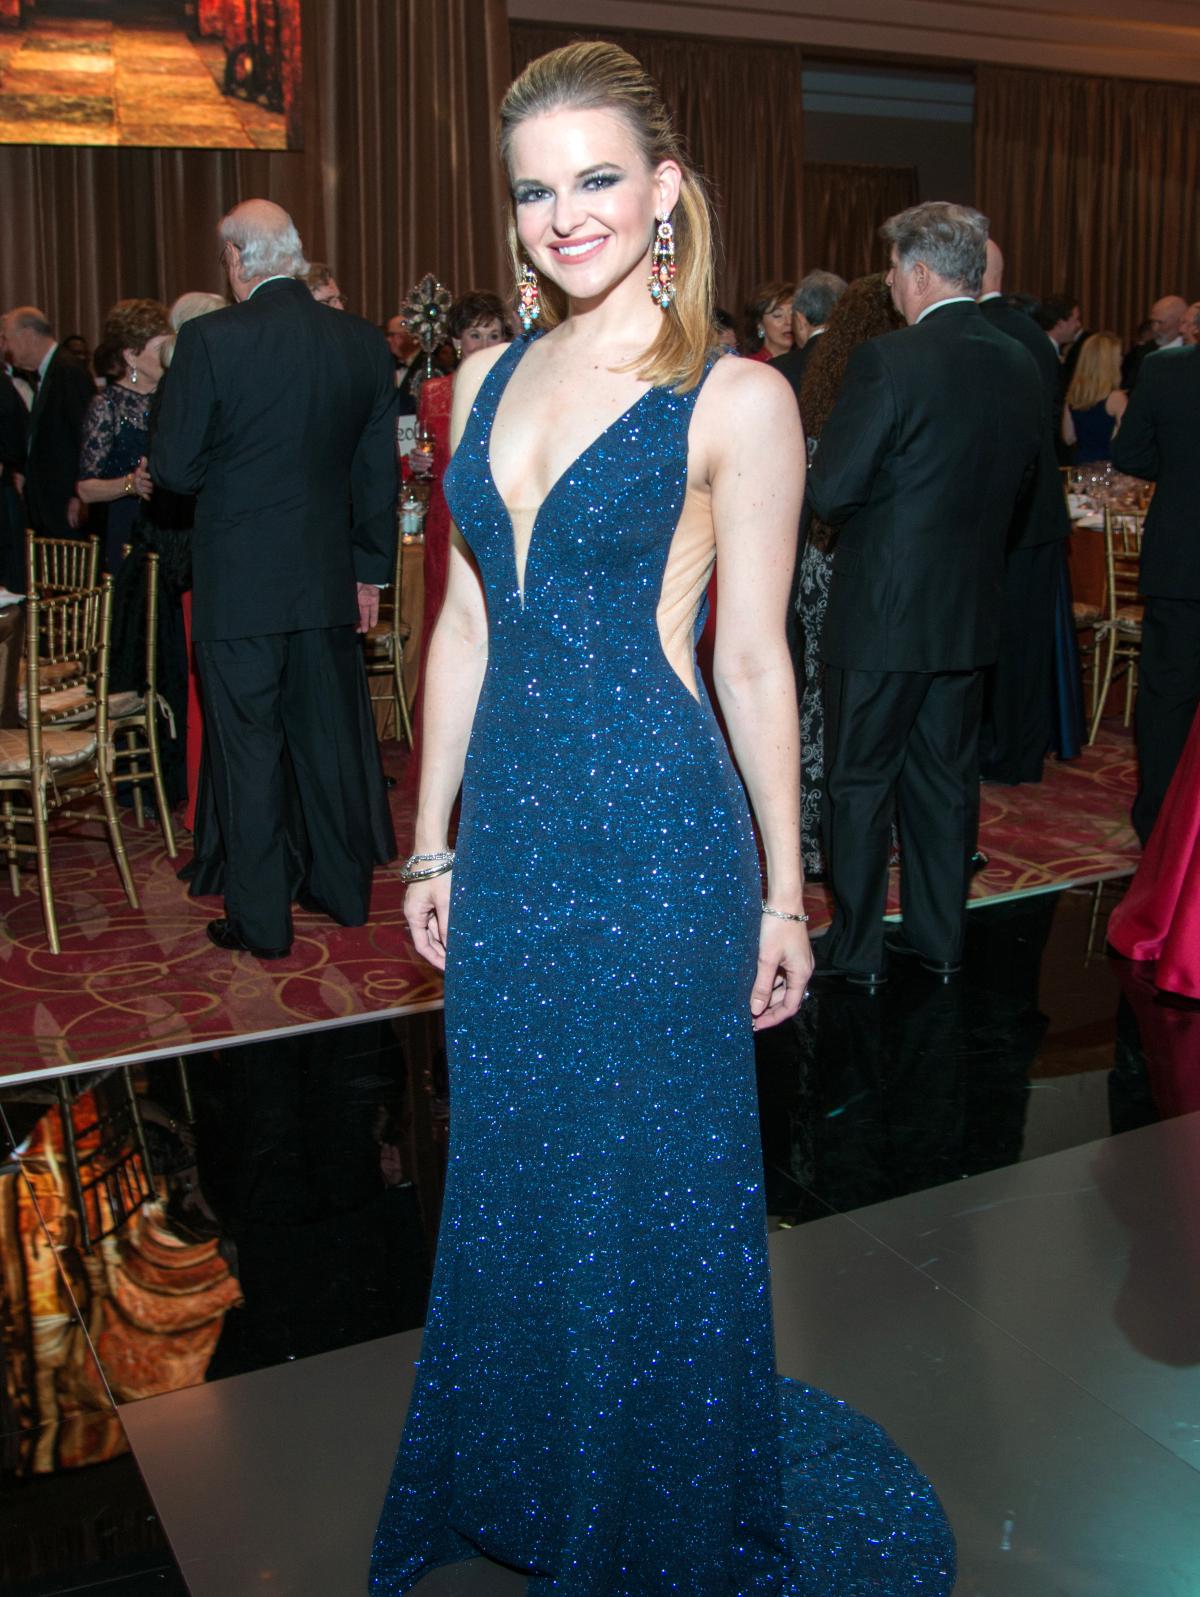 Houston, Ballet Ball gowns, Feb 2017, Kimberly Lombardino in  Jovani